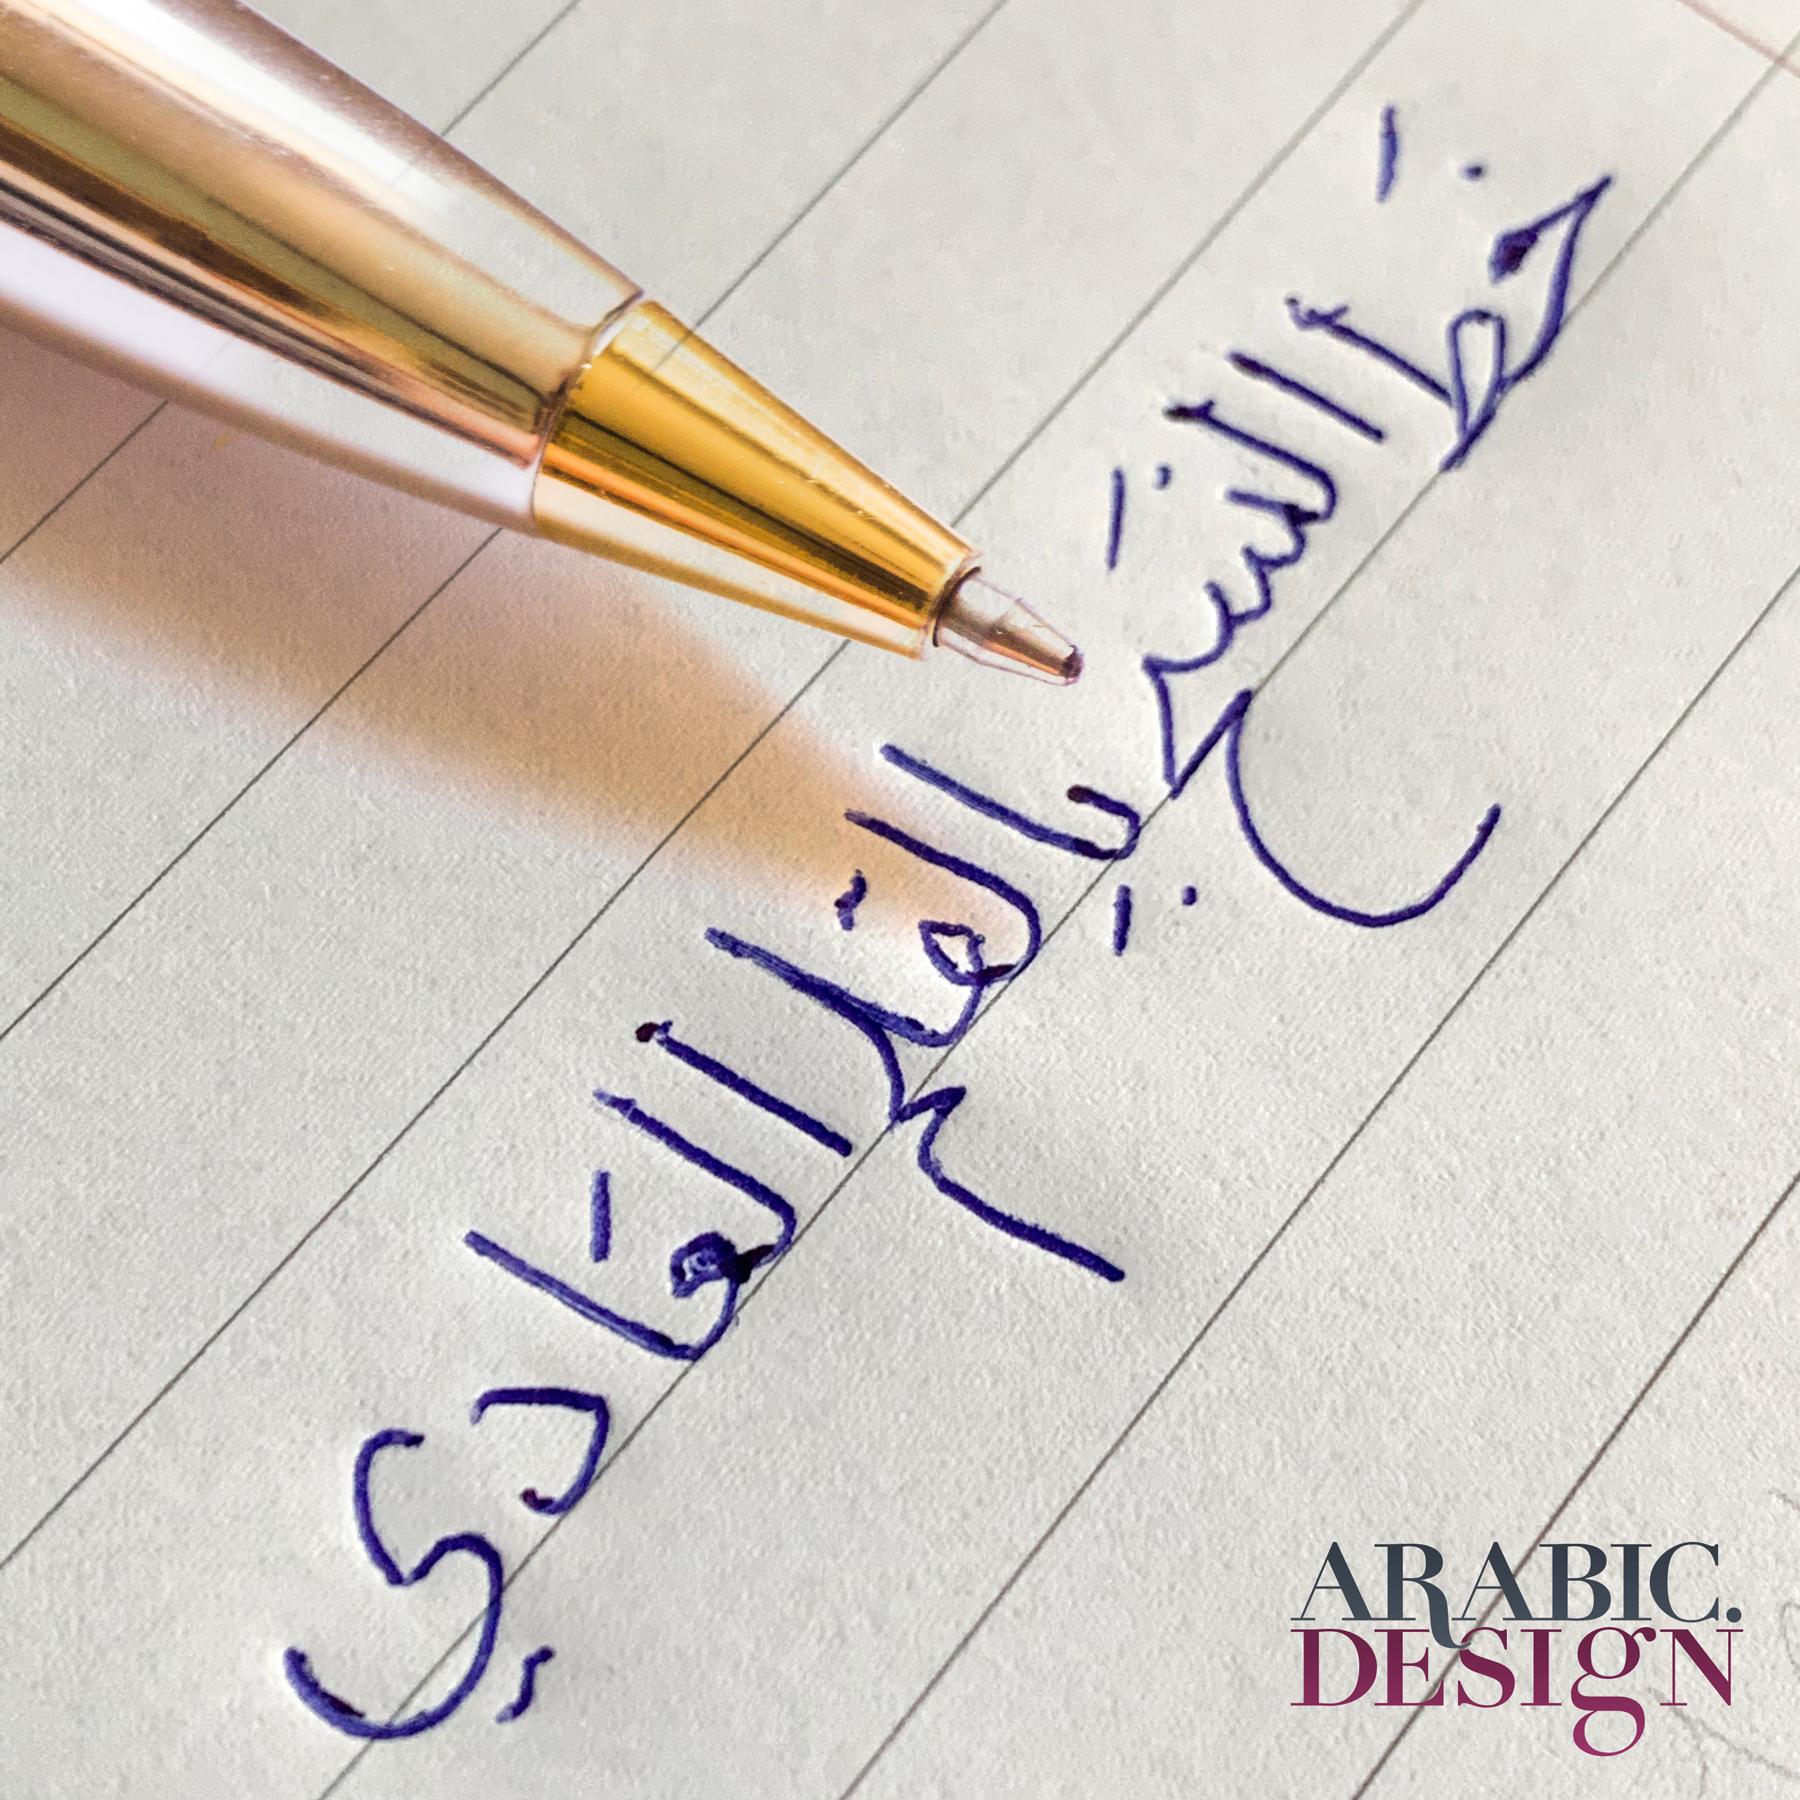 كن قلبا يحمل إنسانا ديواني خط عربي تمرين Arabic Calligraphy Diwani Kind Human Quote Calligraphy Quotes Romantic Words Arabic Quotes